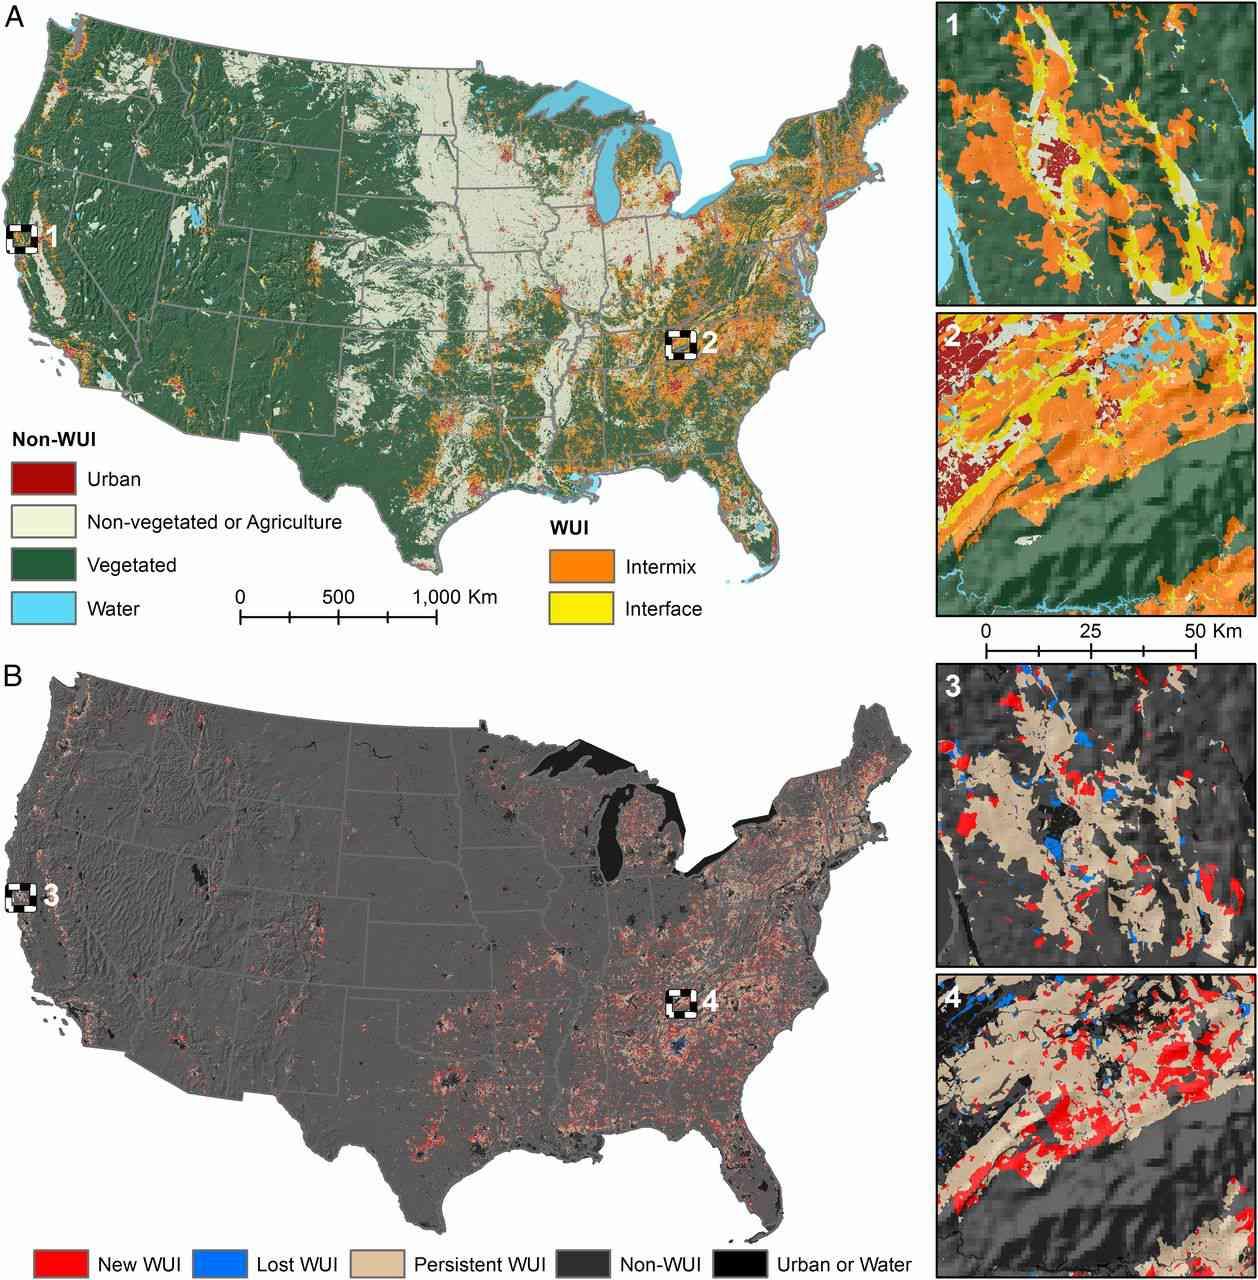 Rapid growth of the US wildland-urban interface raises wildfire risk